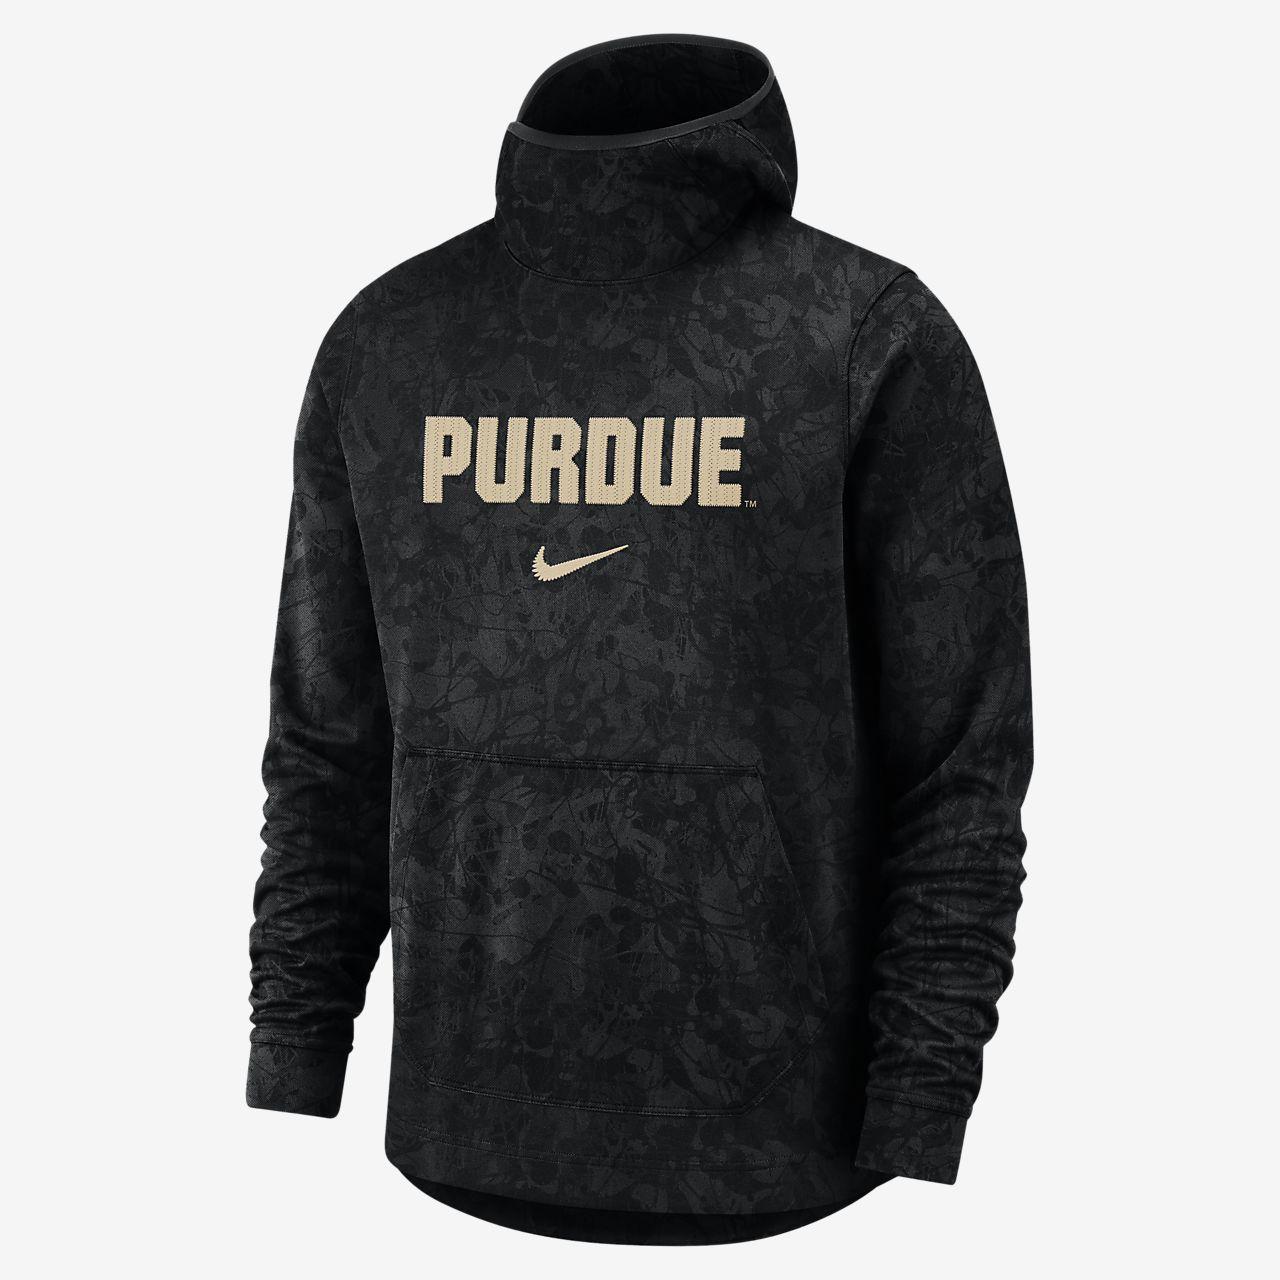 Nike College Dri-FIT Spotlight (Purdue) Men's Pullover Basketball Hoodie